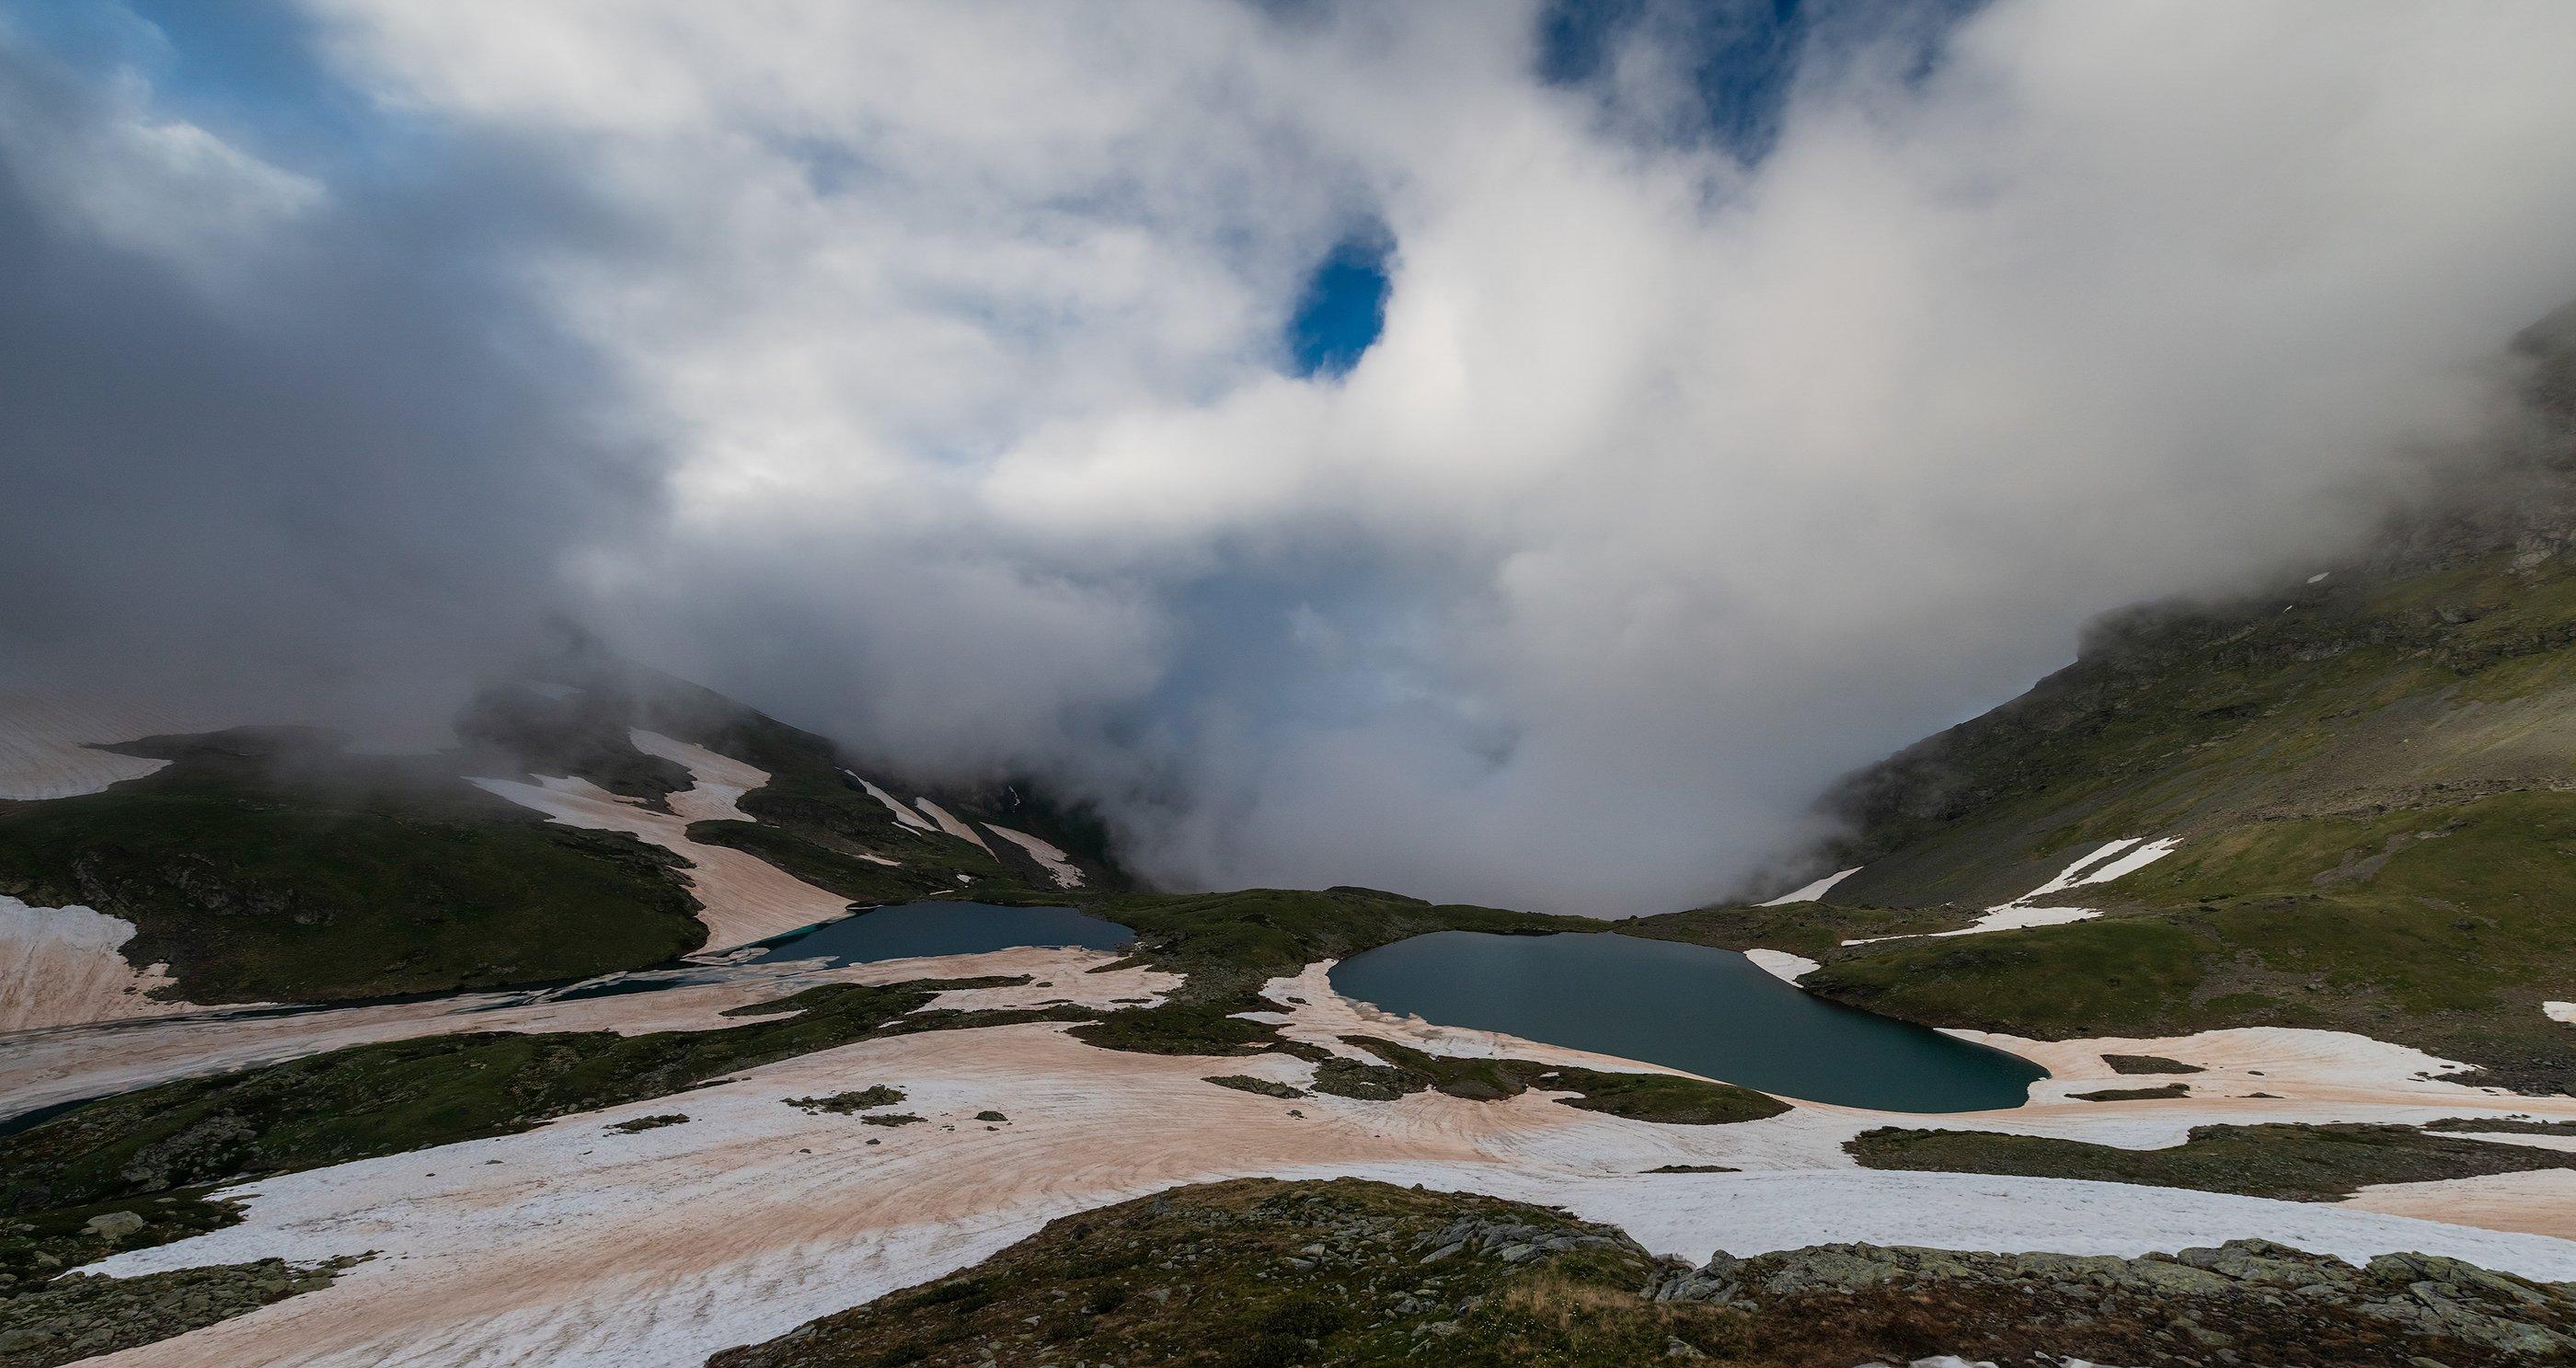 кавказ, горы, кчр, загедан, озеро, июнь, 2018, ФЁДОР